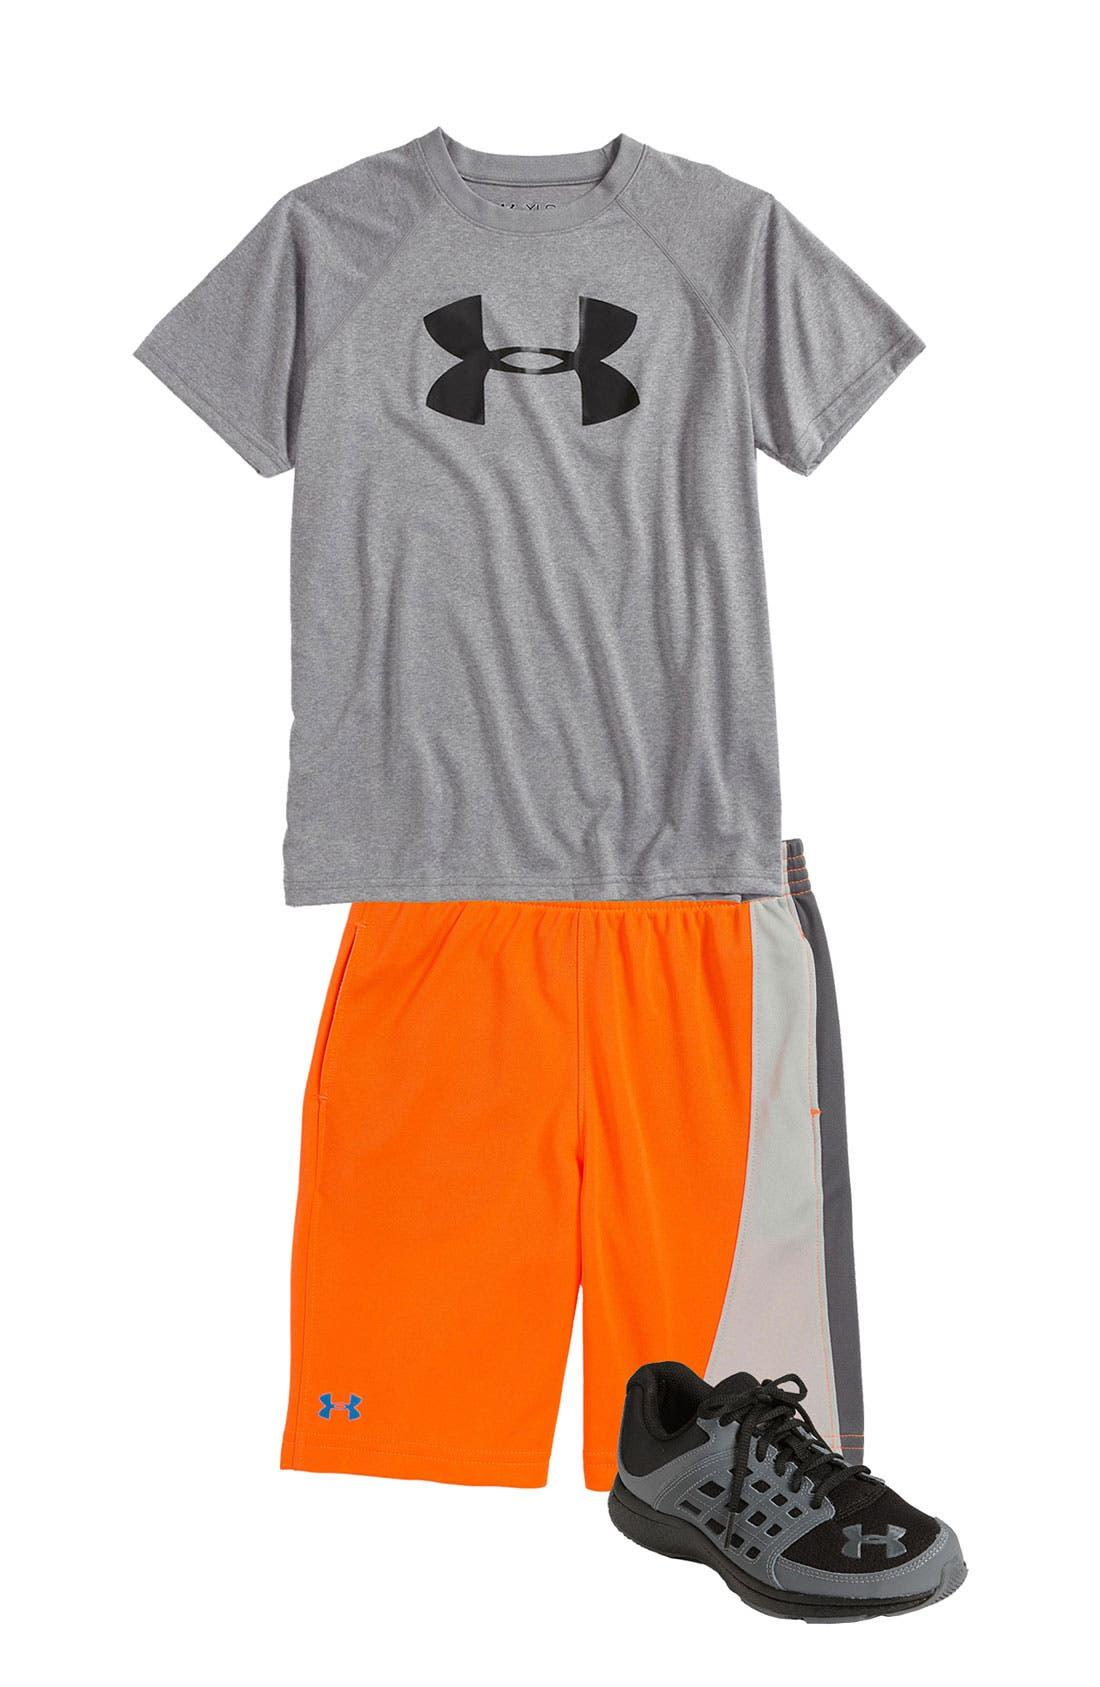 Alternate Image 1 Selected - Under Armour T-Shirt, Shorts & Sneaker (Little Boys)